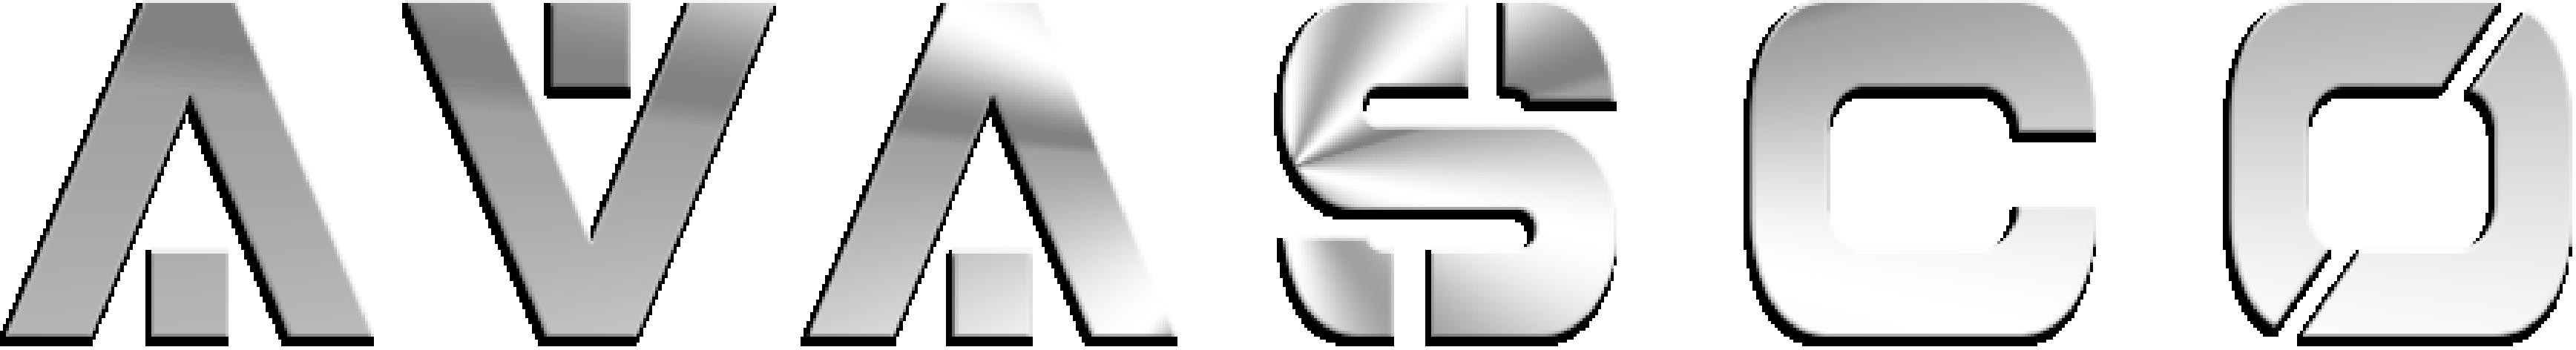 Avasco Logosu